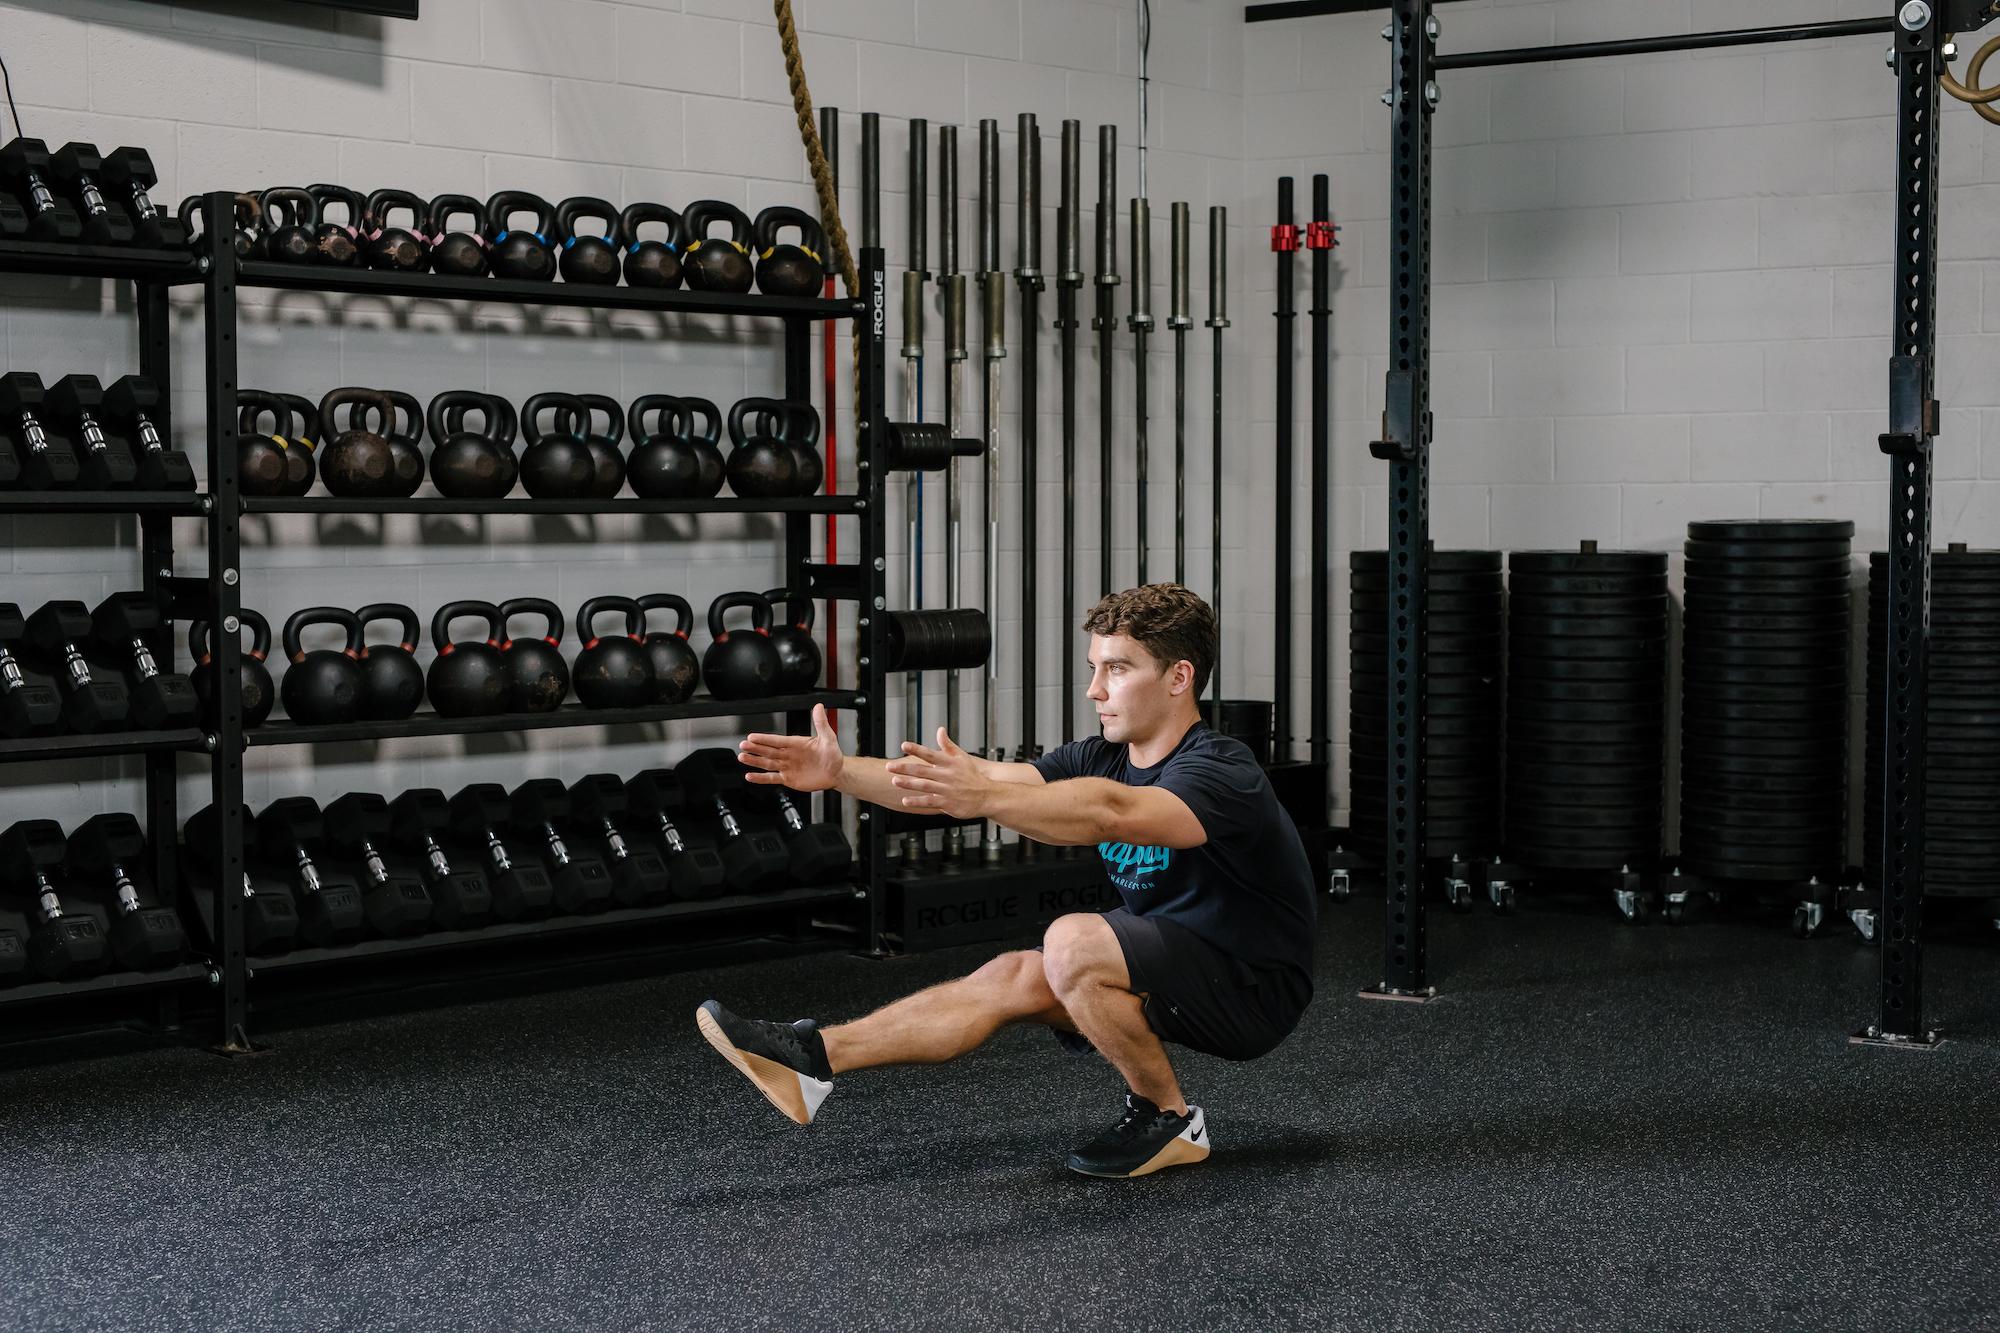 Points of Performance: The Single-Leg Squat